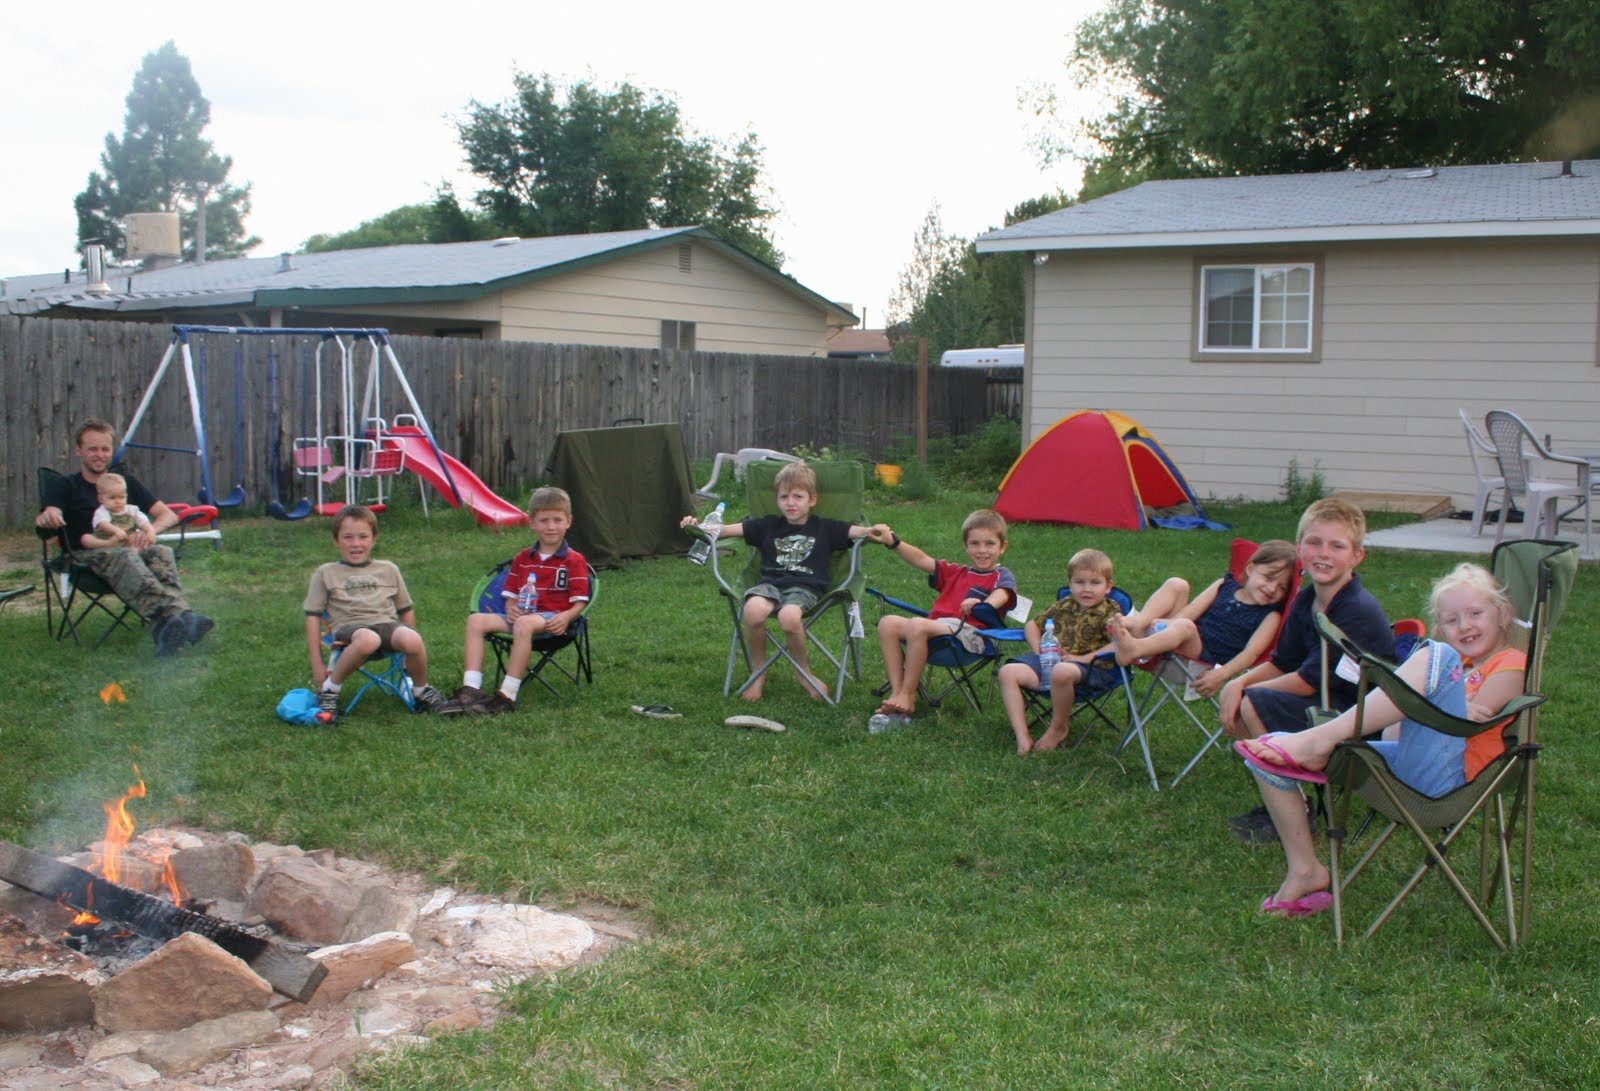 backyard campout party